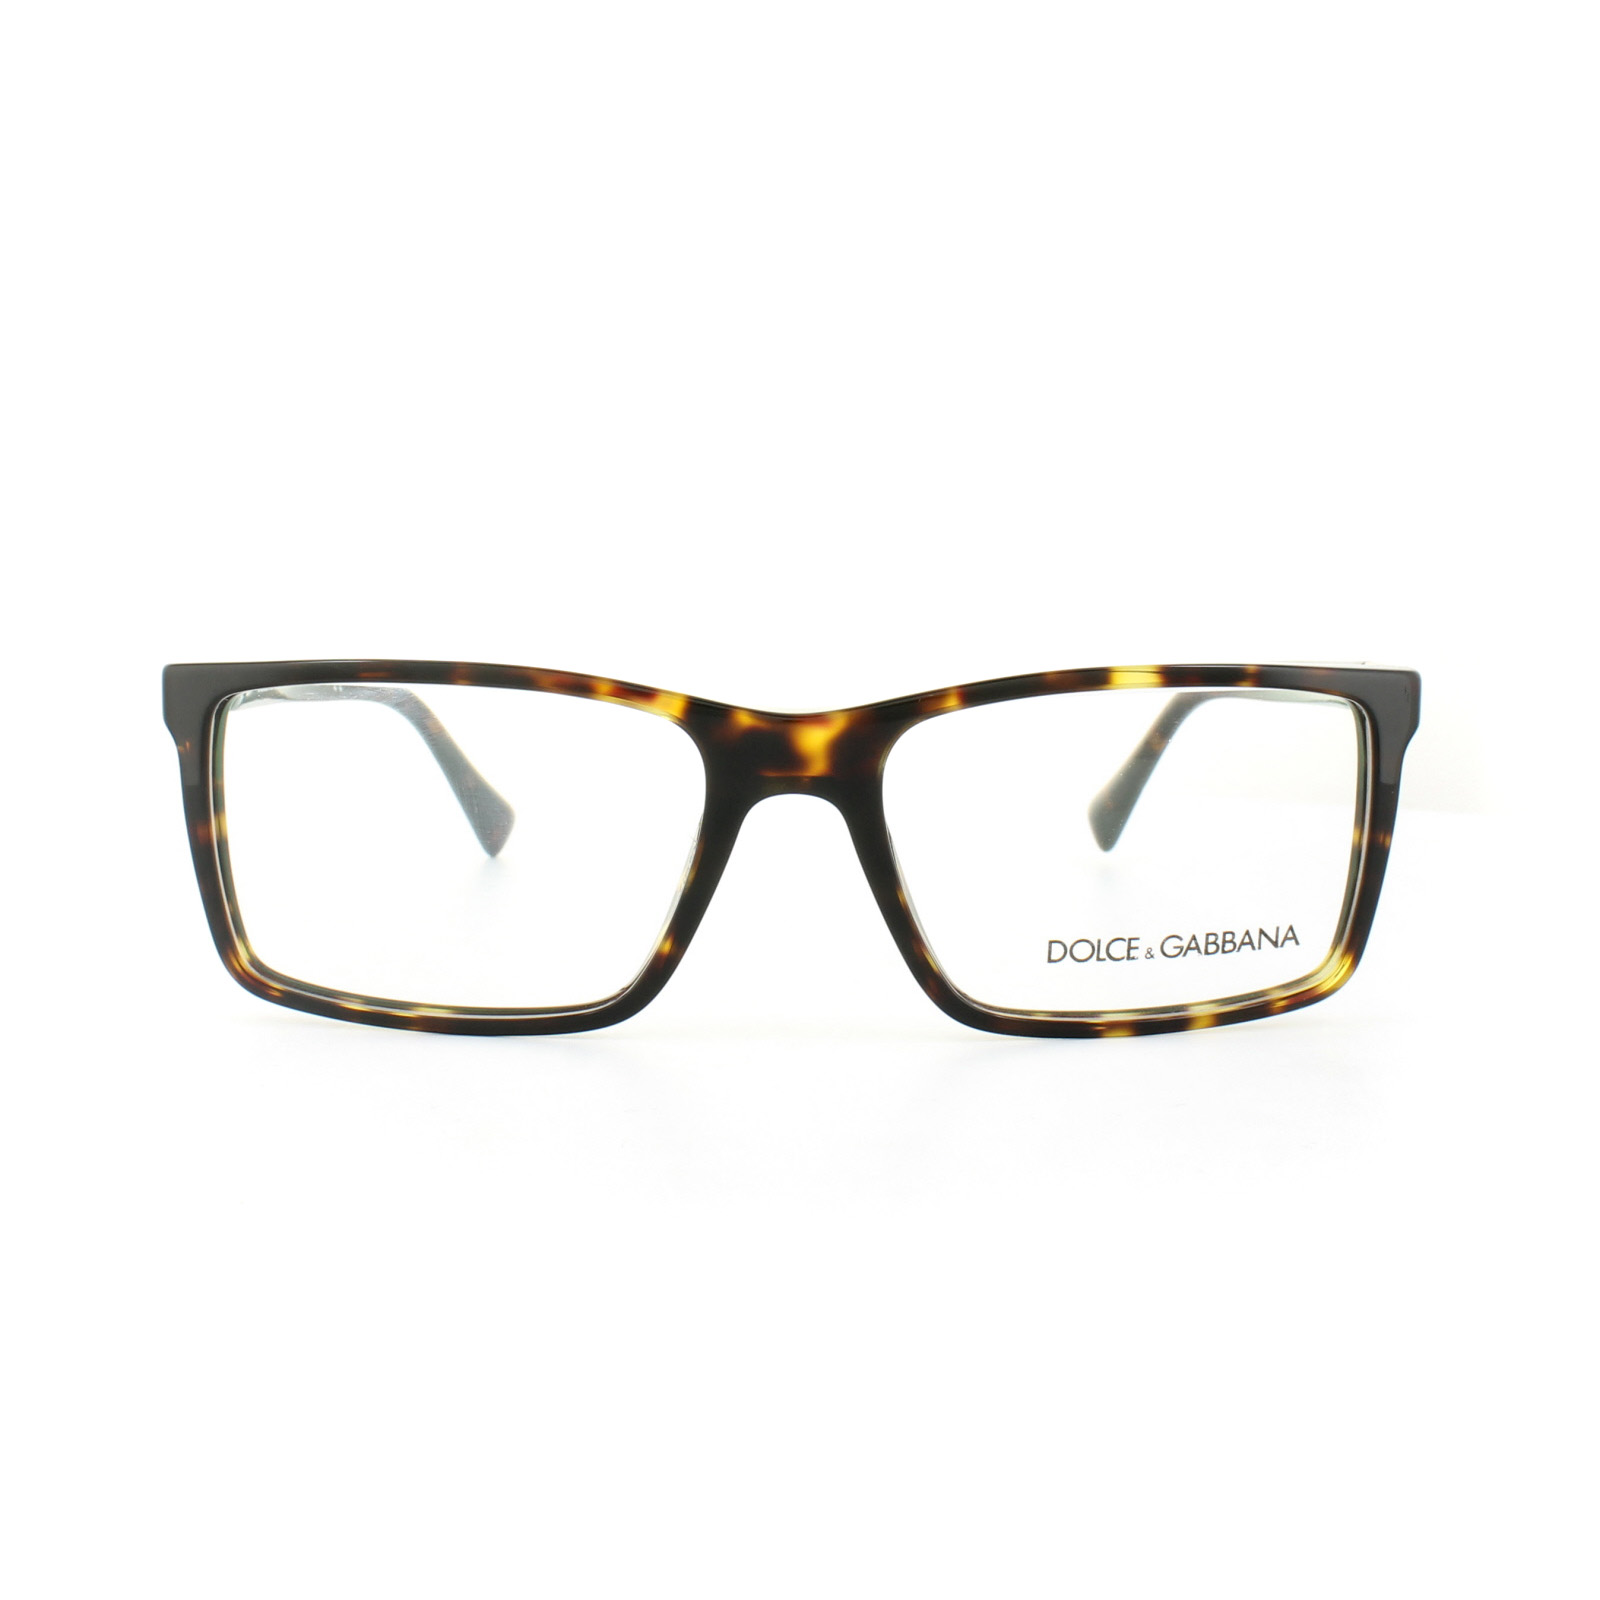 sentinel dolce and gabbana glasses frames dg 3217 502 havana mens 55mm - Dolce And Gabbana Glasses Frames